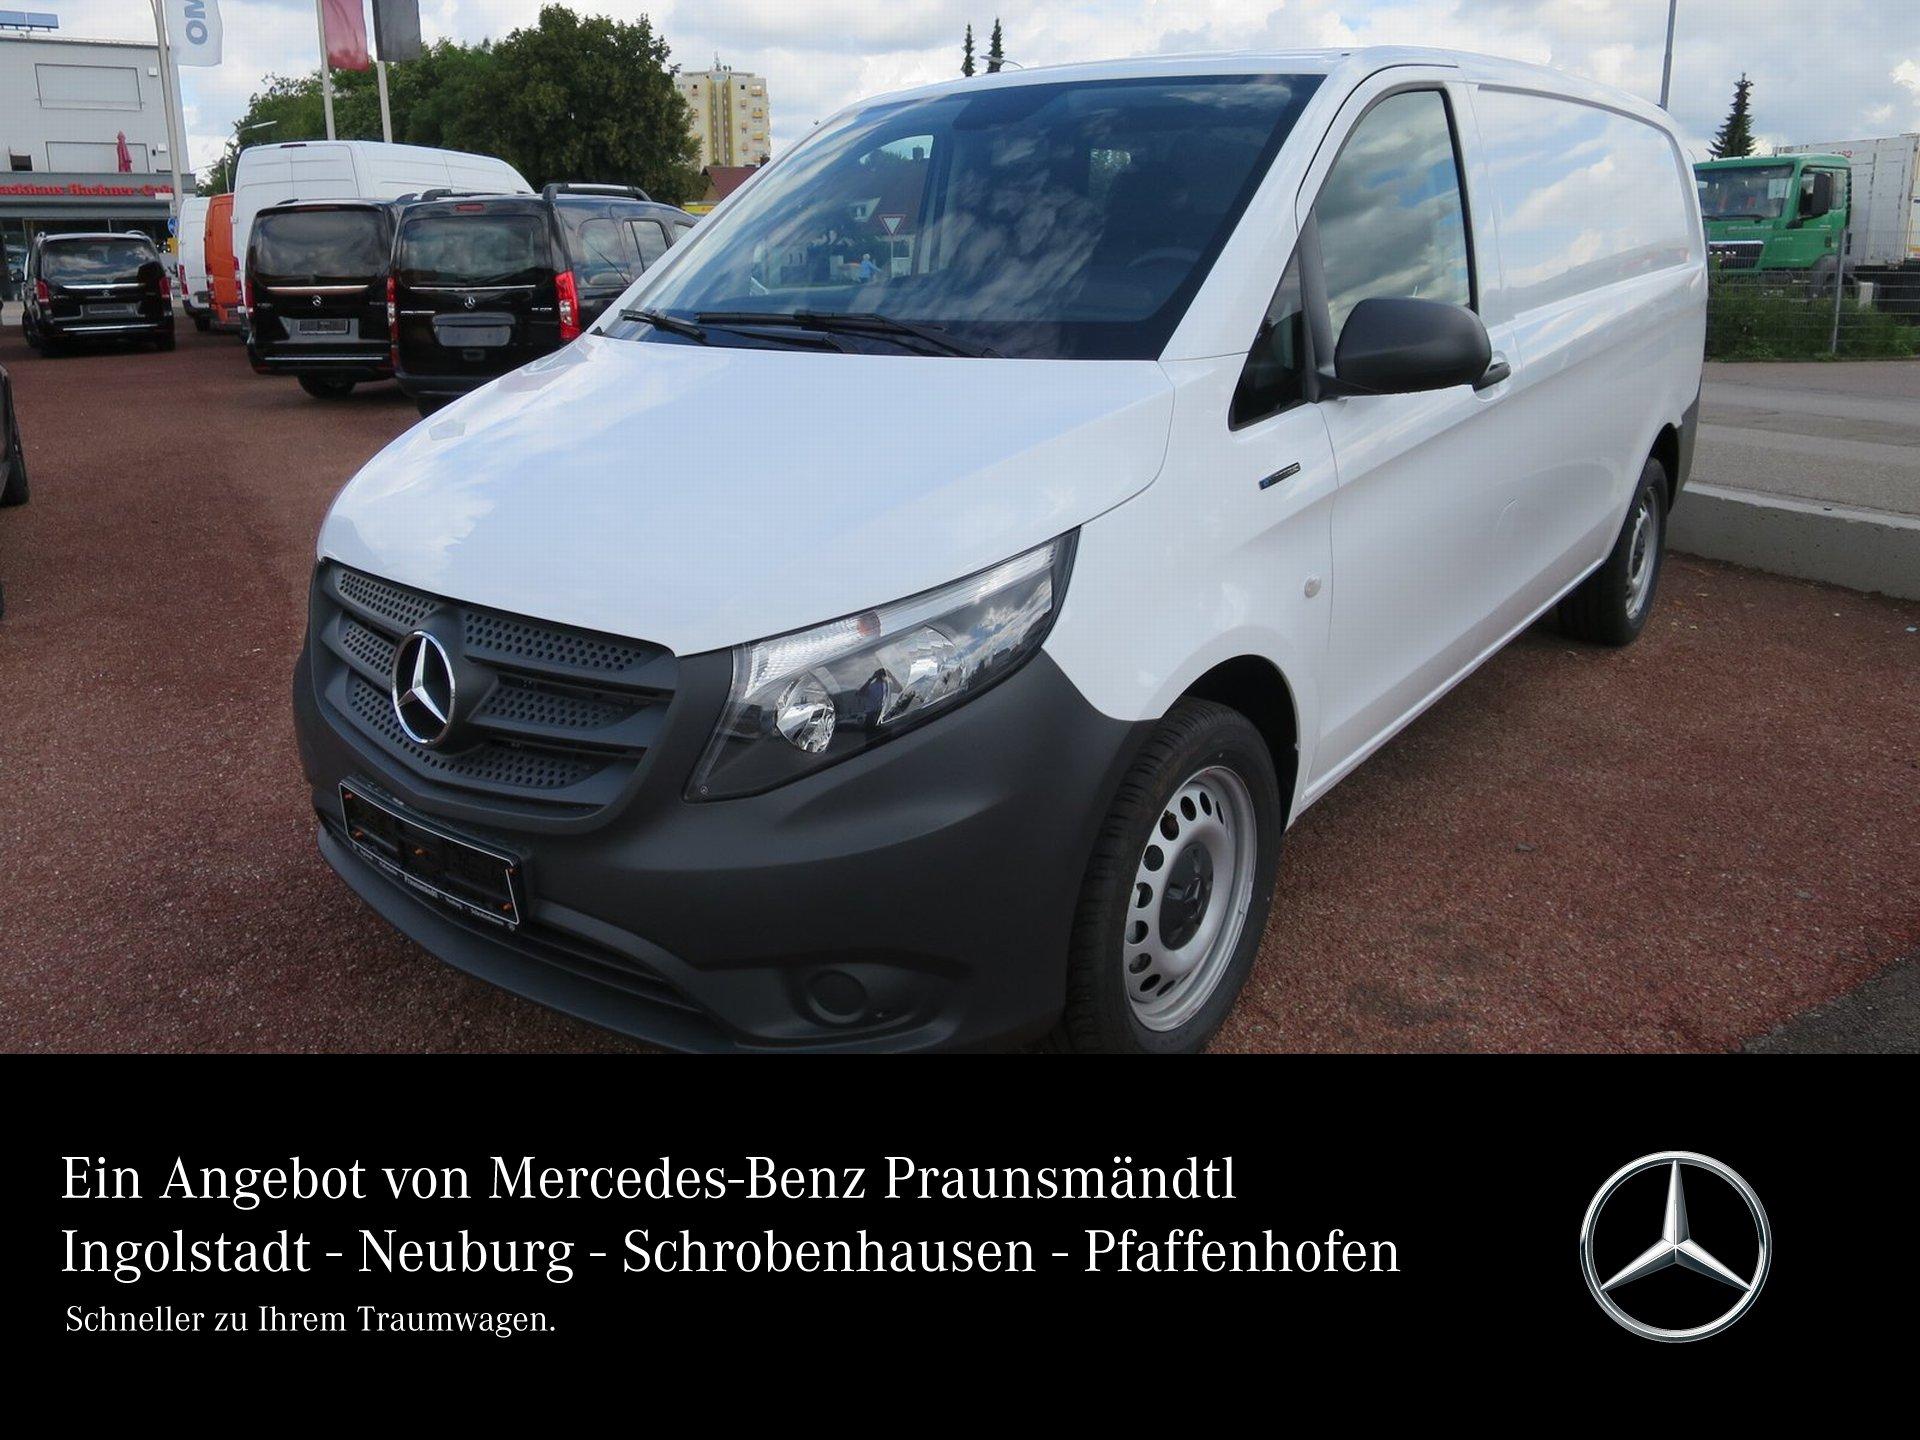 Mercedes-Benz eVito 111 Kasten lang Trennwand Klima Rückfahrk., Jahr 2019, Elektro